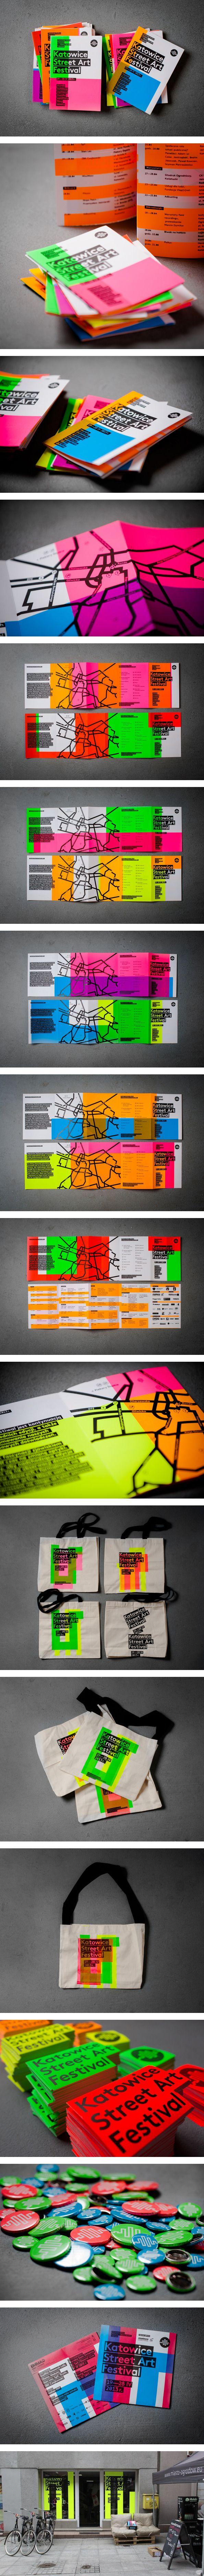 Katowice Street Art Festival // charte graphique